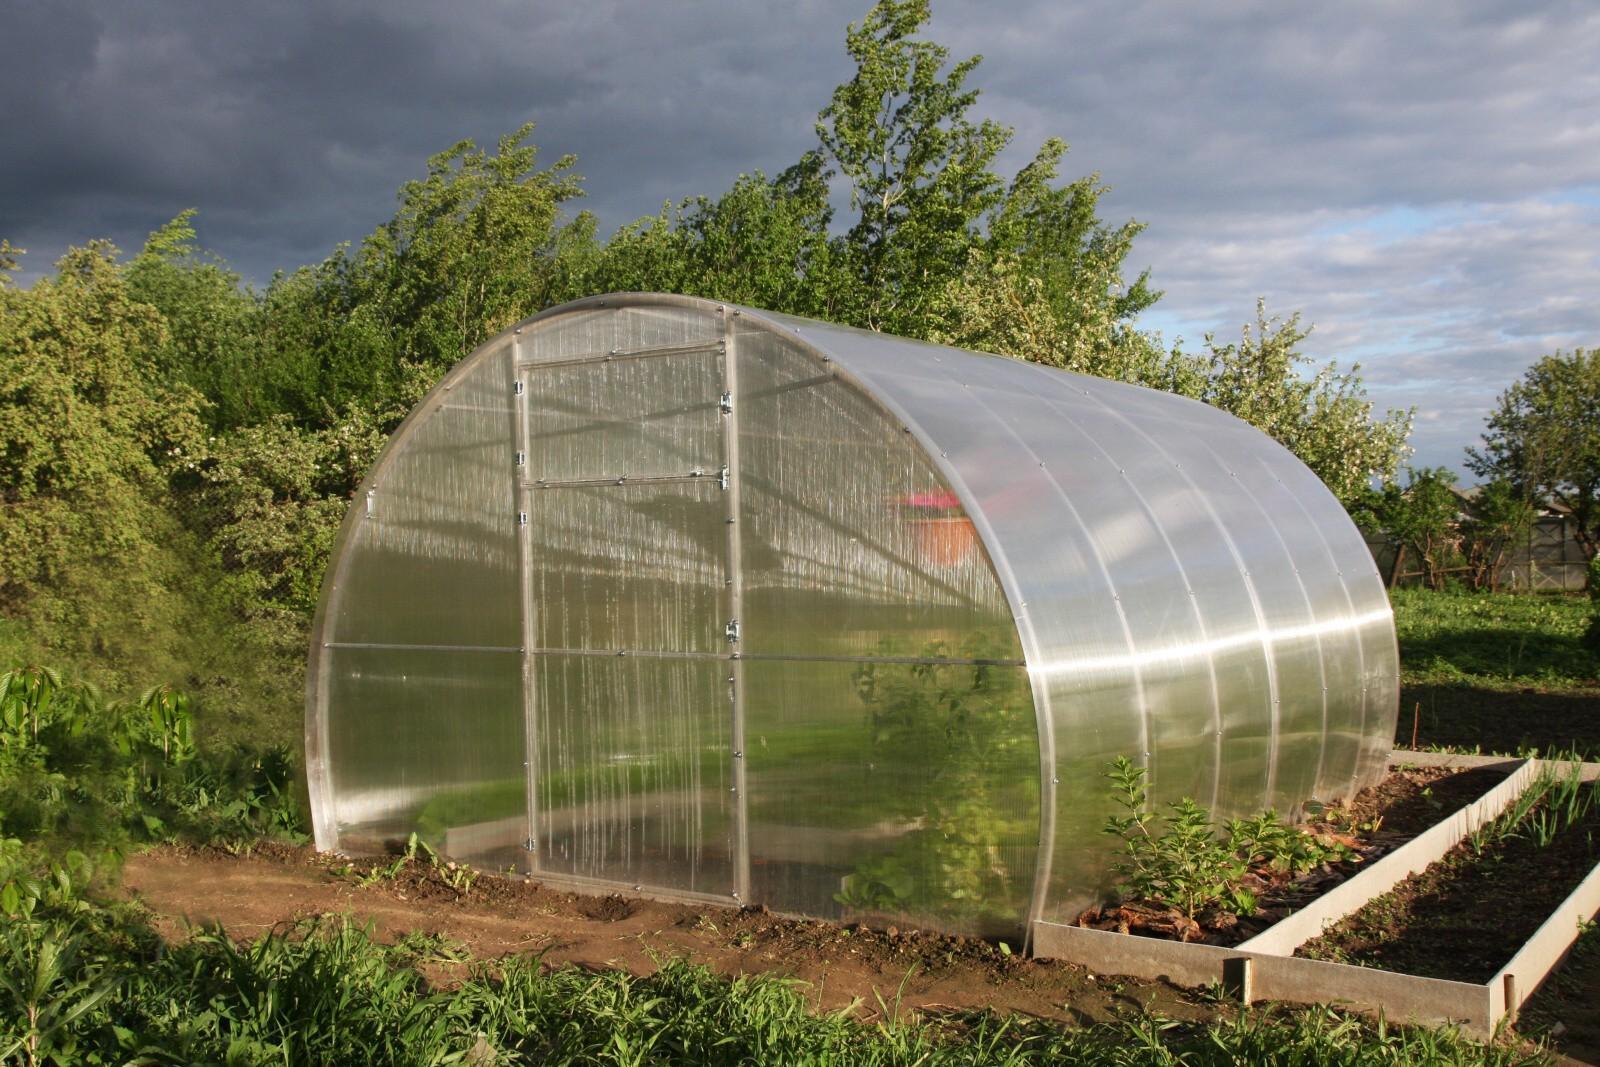 skleník LANITPLAST DNĚPR 3,14x10 m PC 8 mm